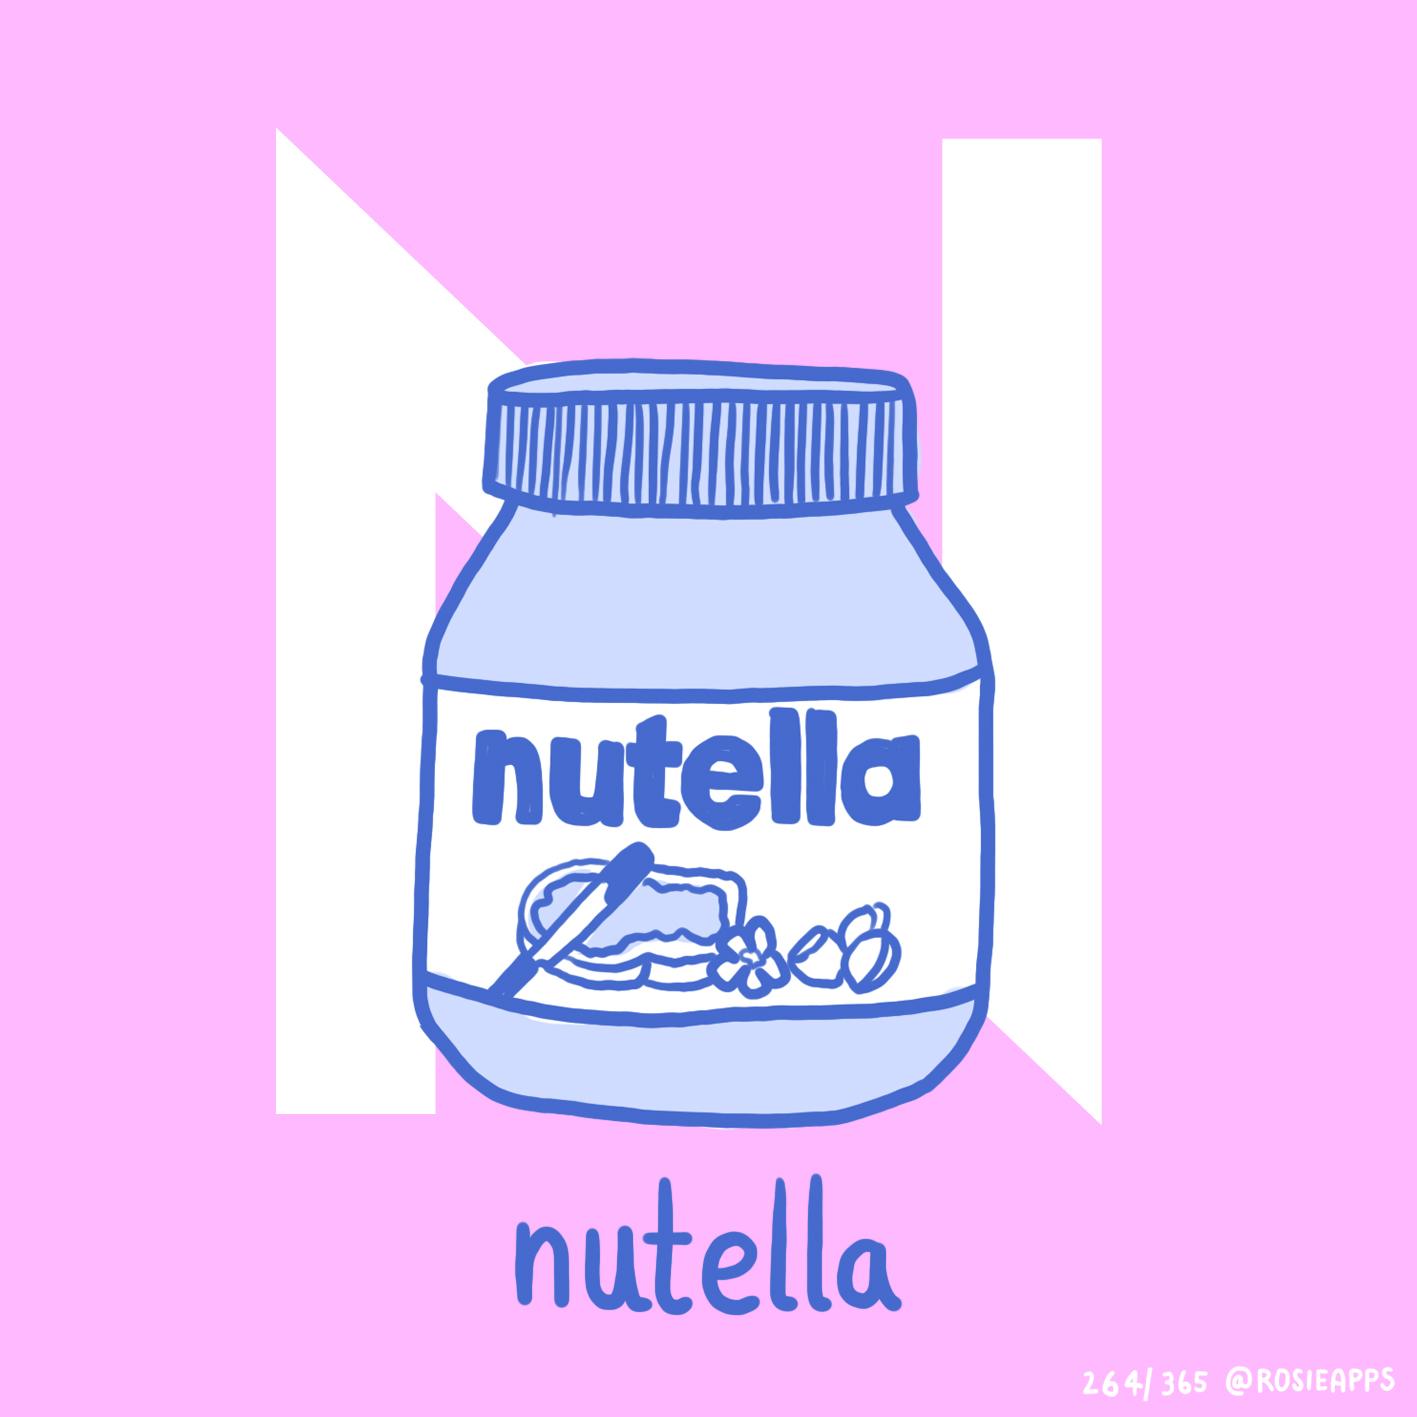 September-264-365 nutella.jpg